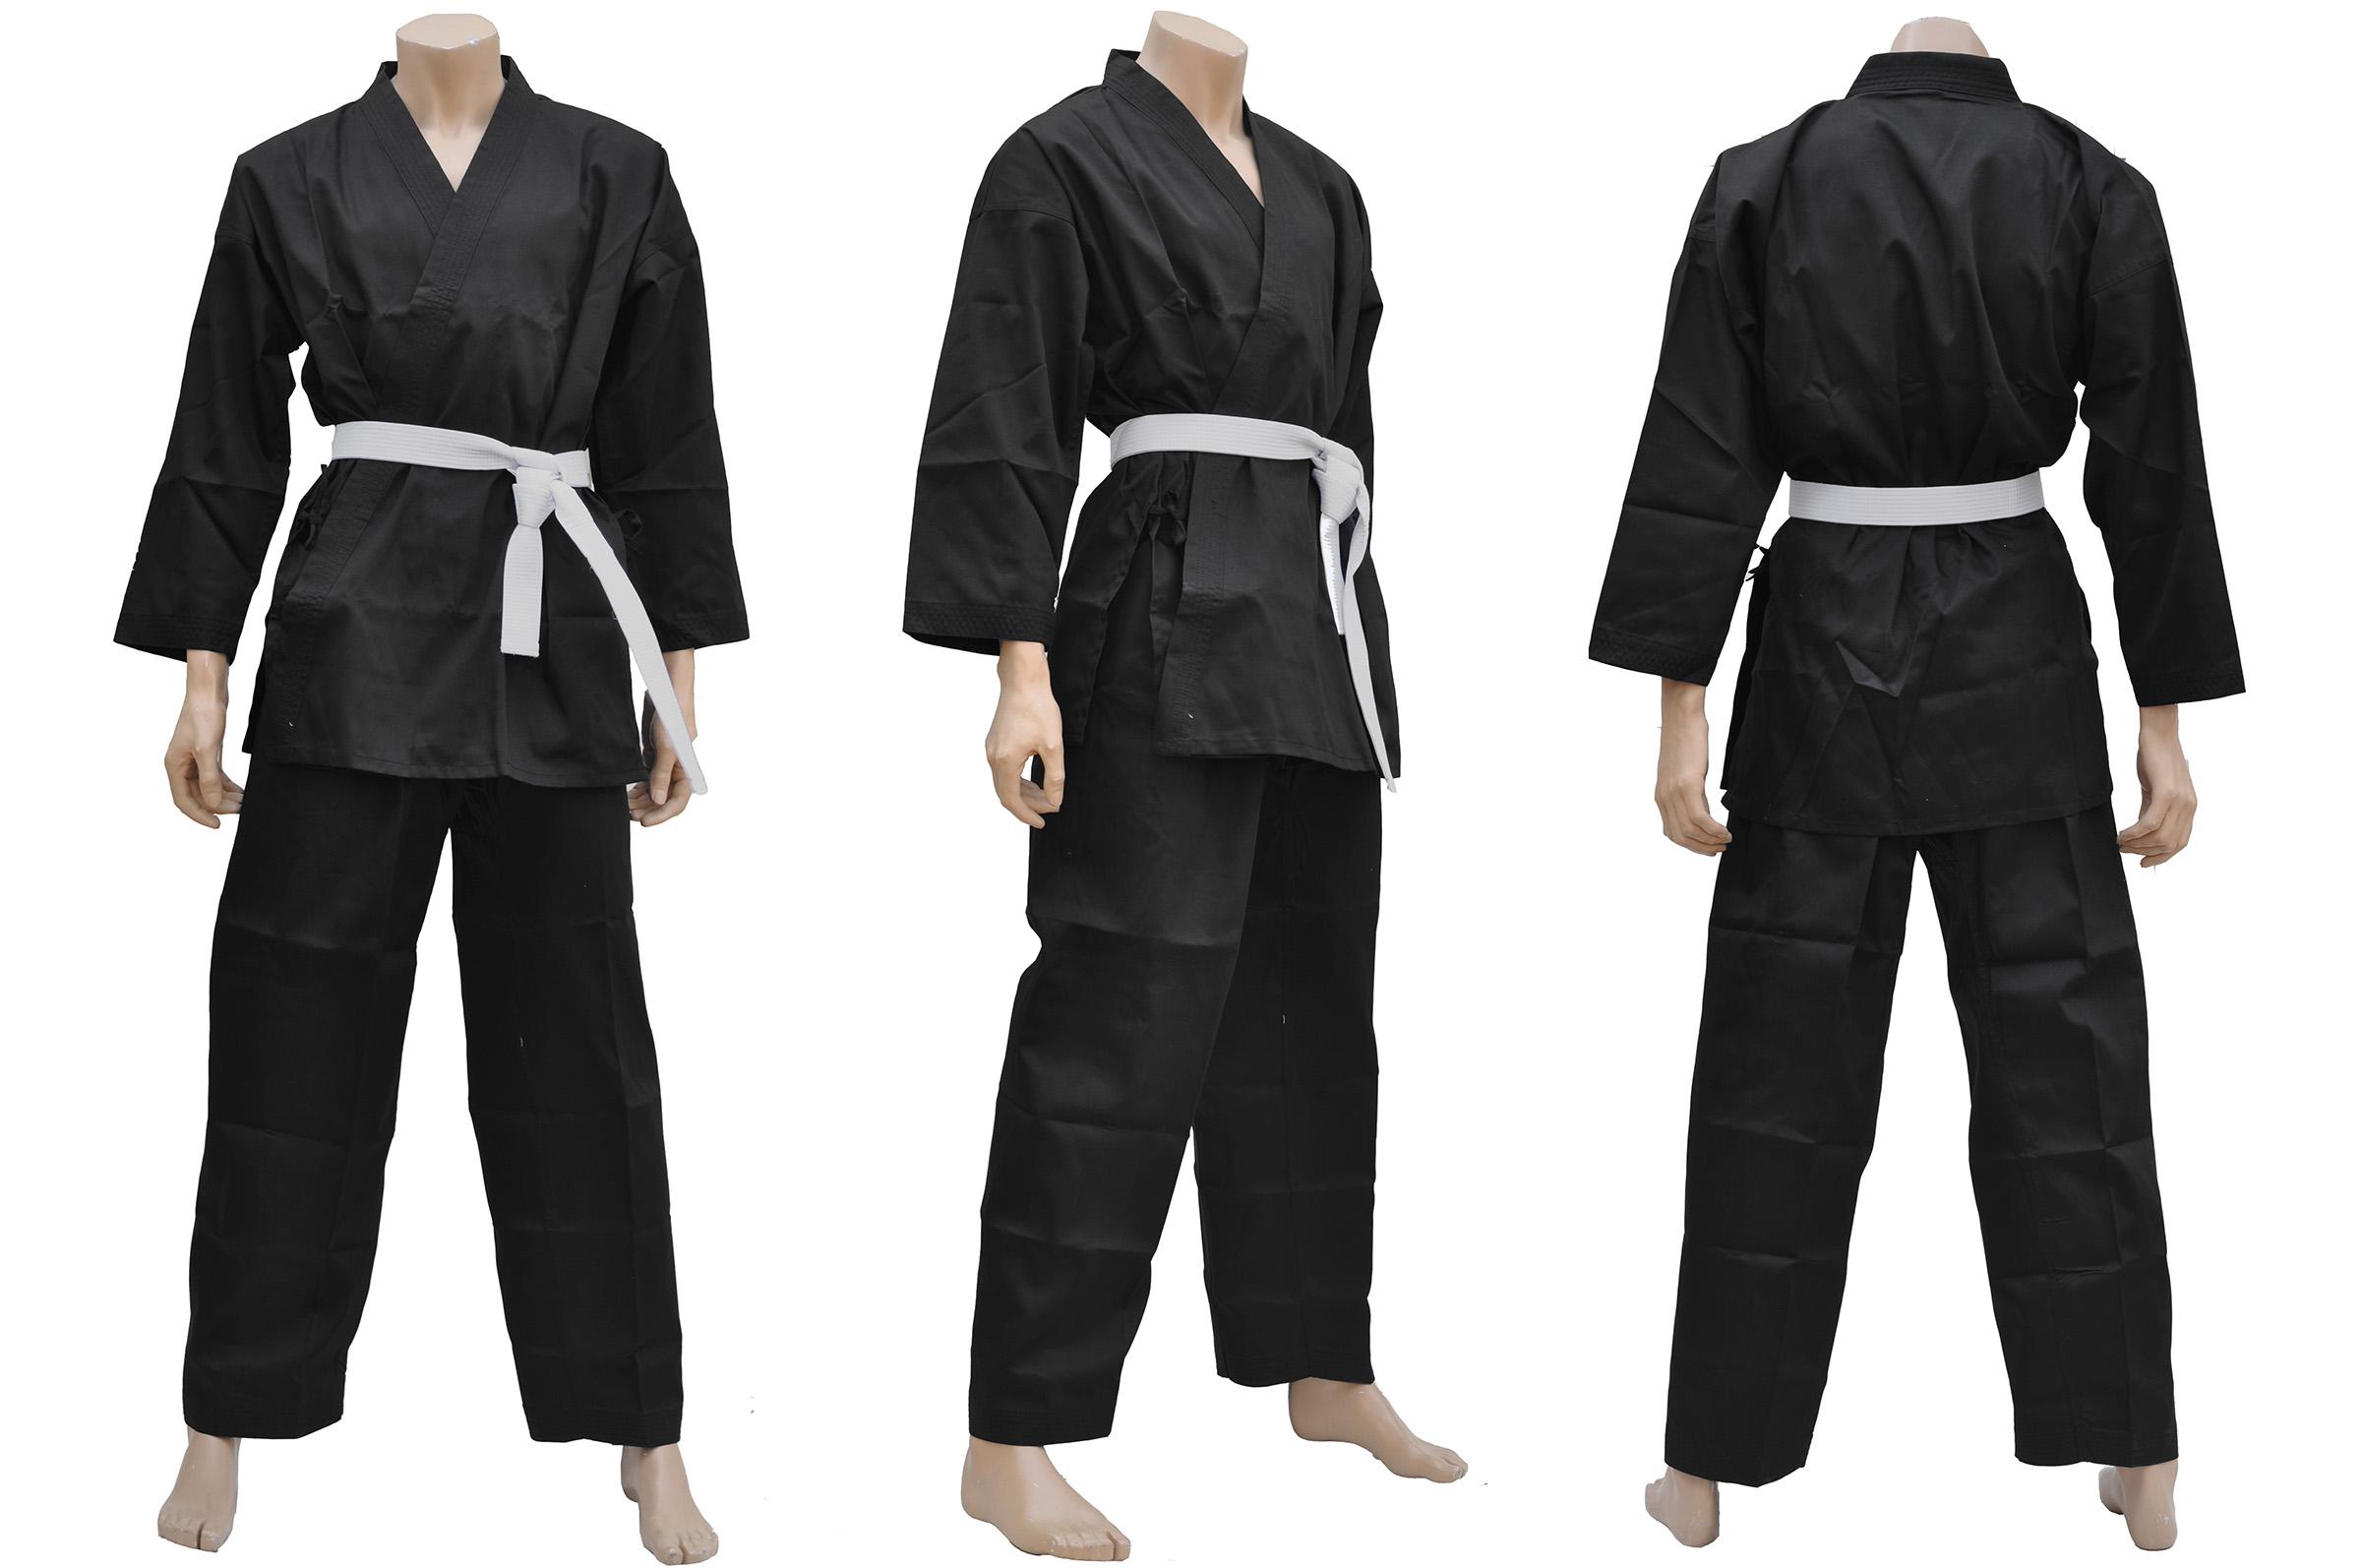 [Déstock] Kimono Karaté, Noir - DragonSports.eu